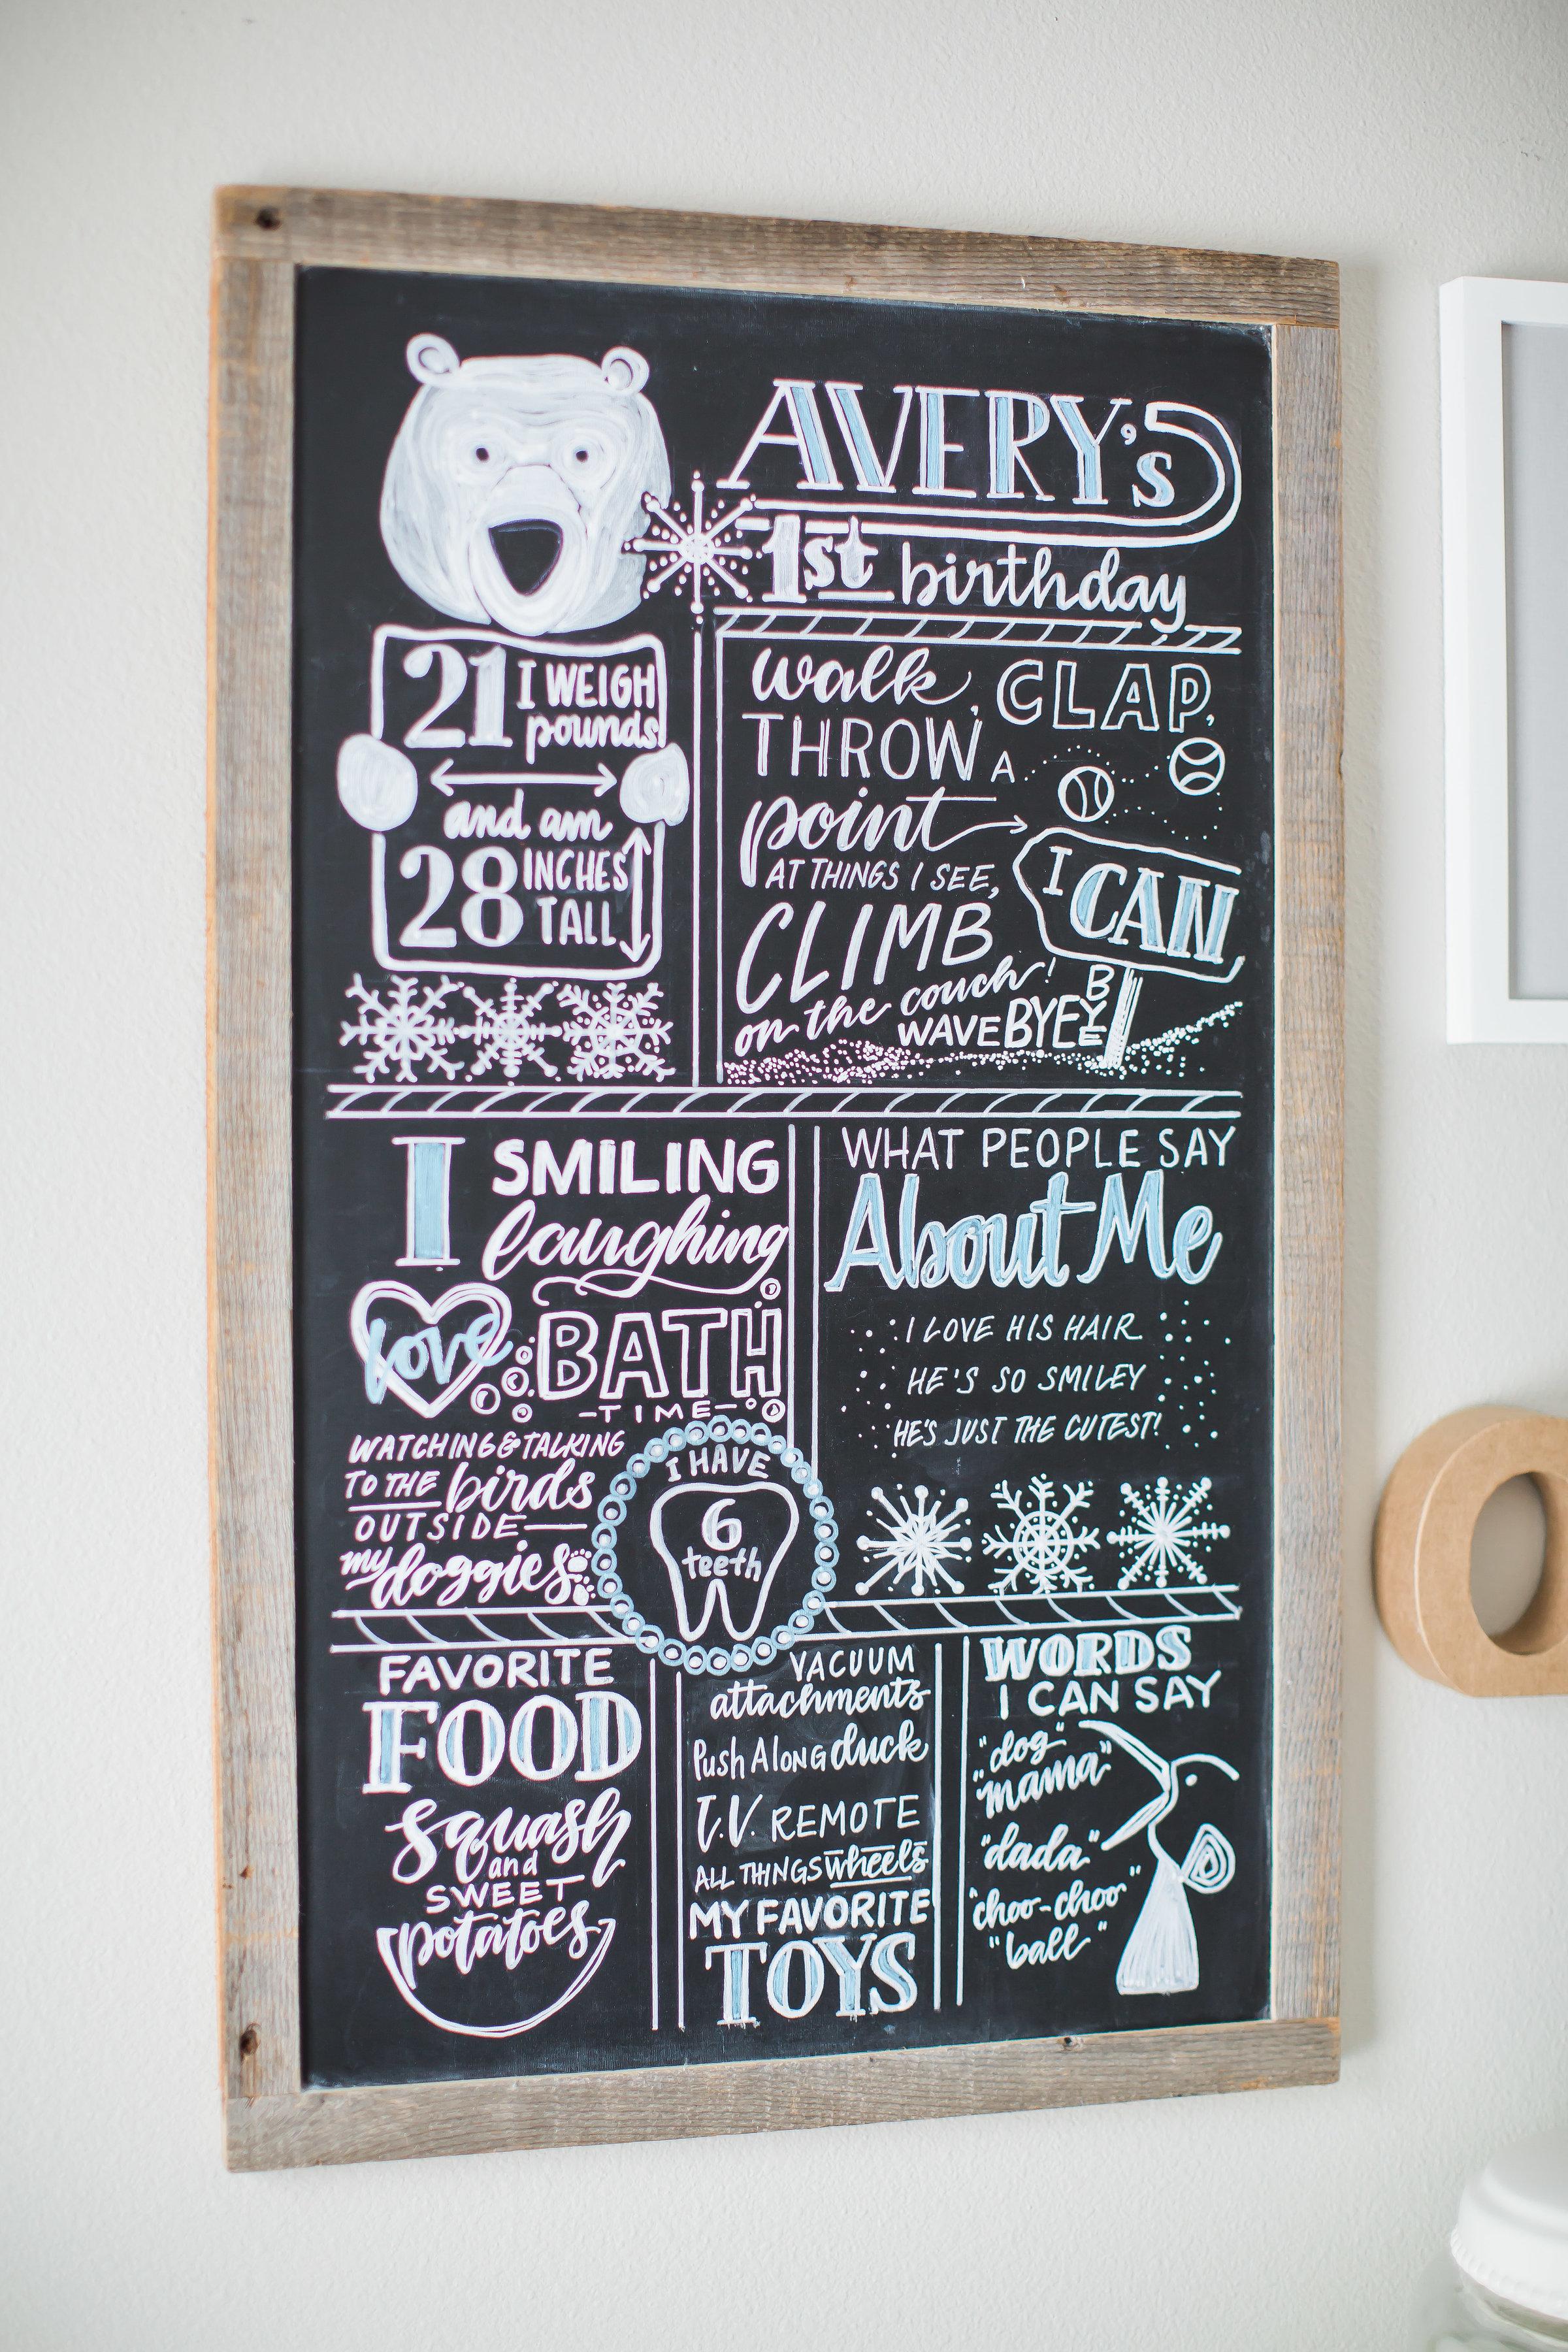 Avery1stBirthday-12